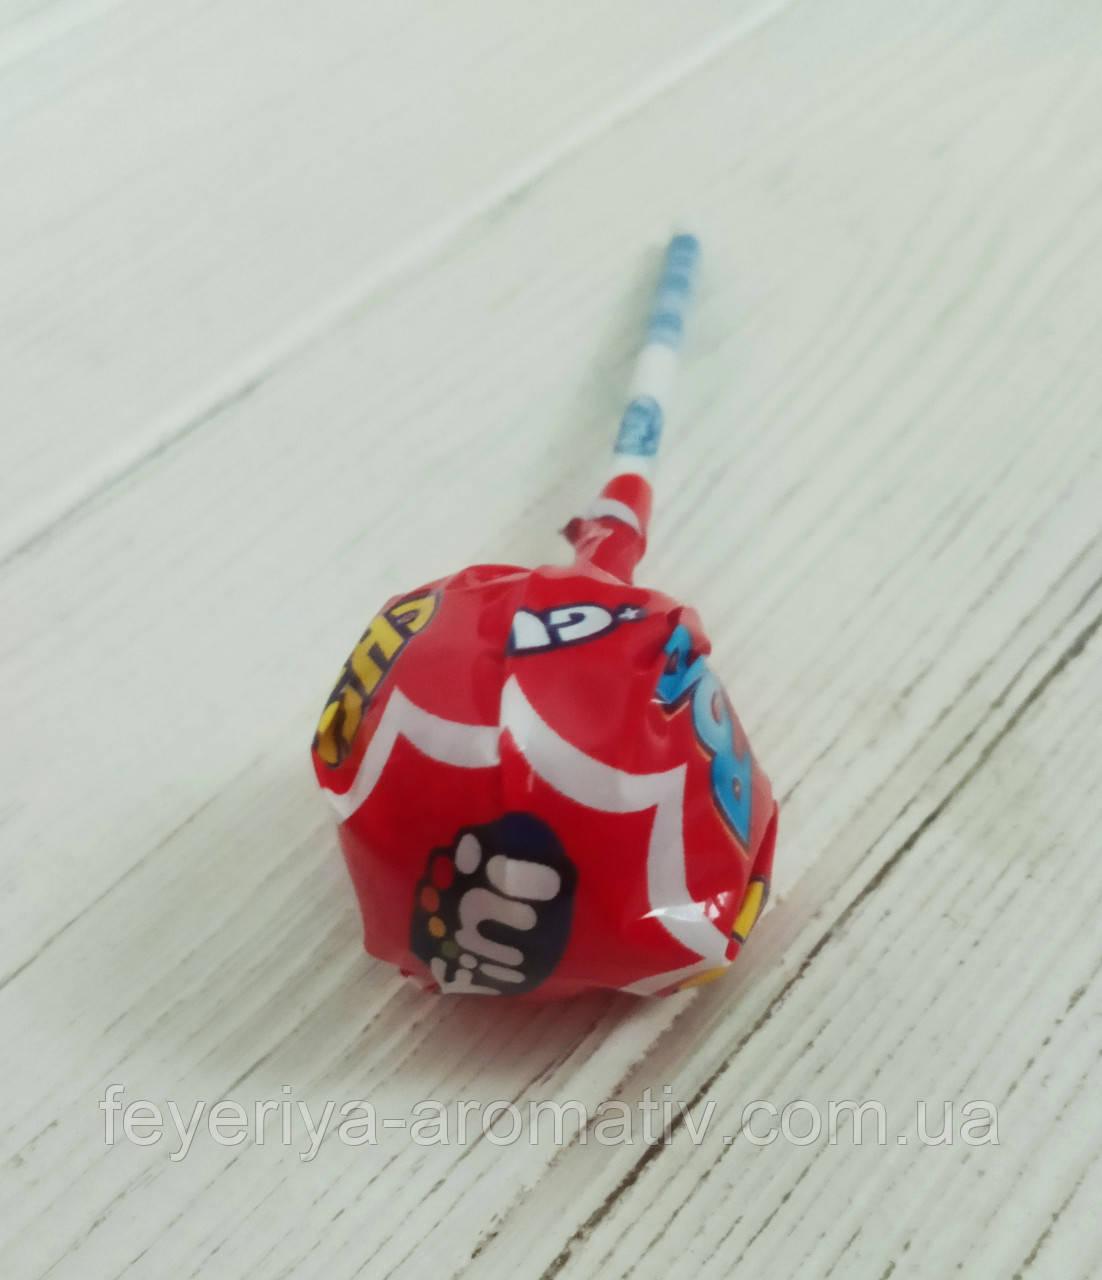 Леденец на палочке со жвачкой Fini Pop Cherry (Испания)